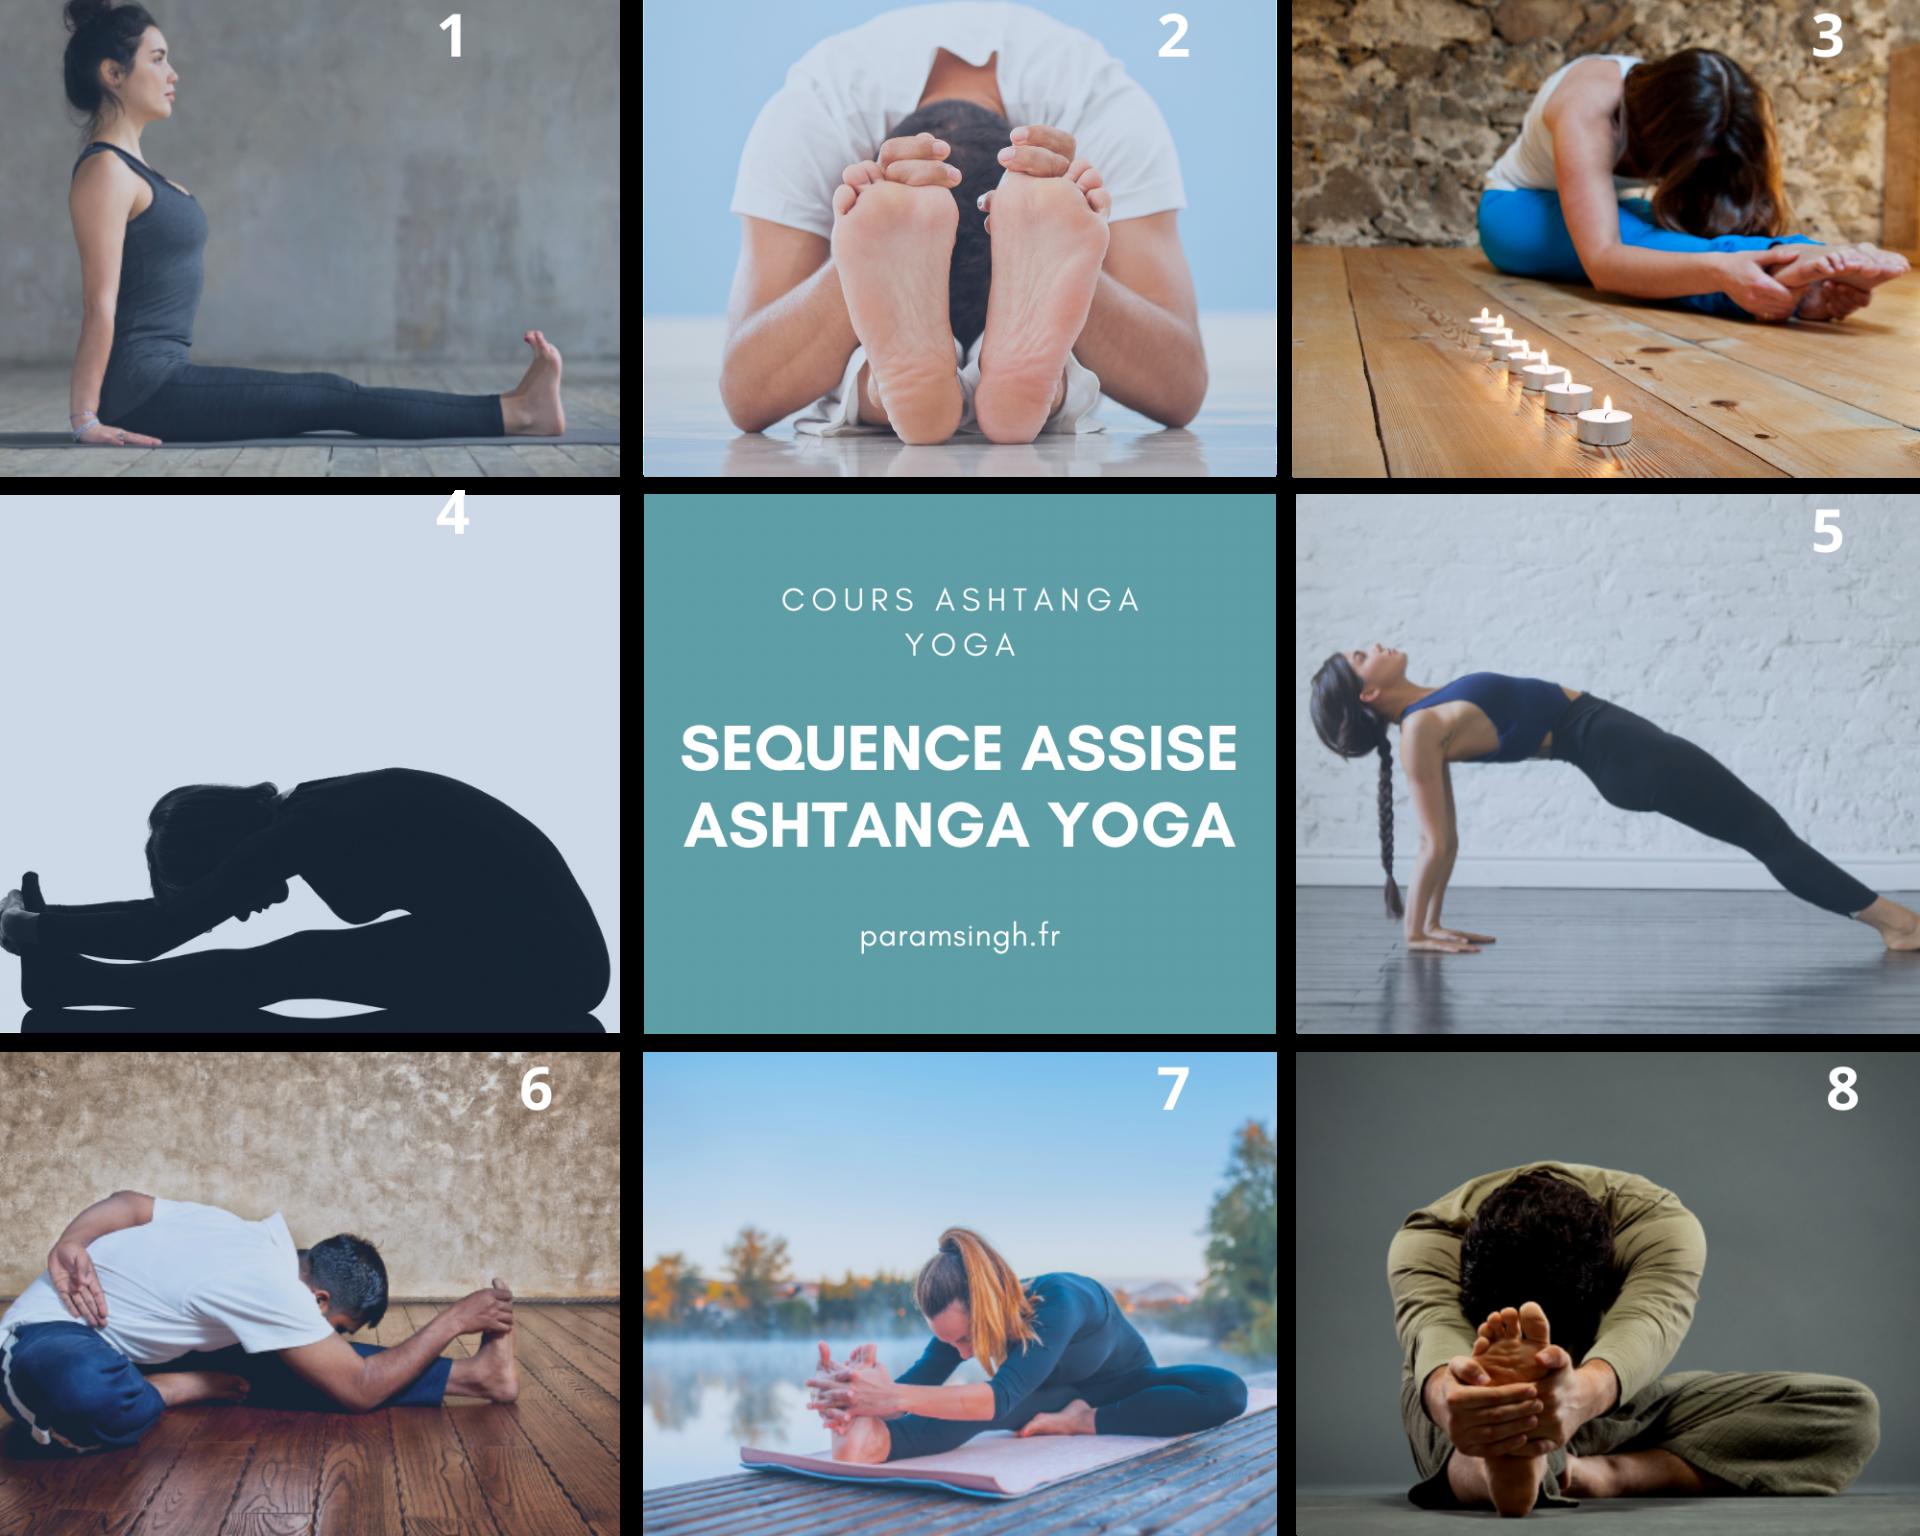 Sequence assise ashtanga part 1